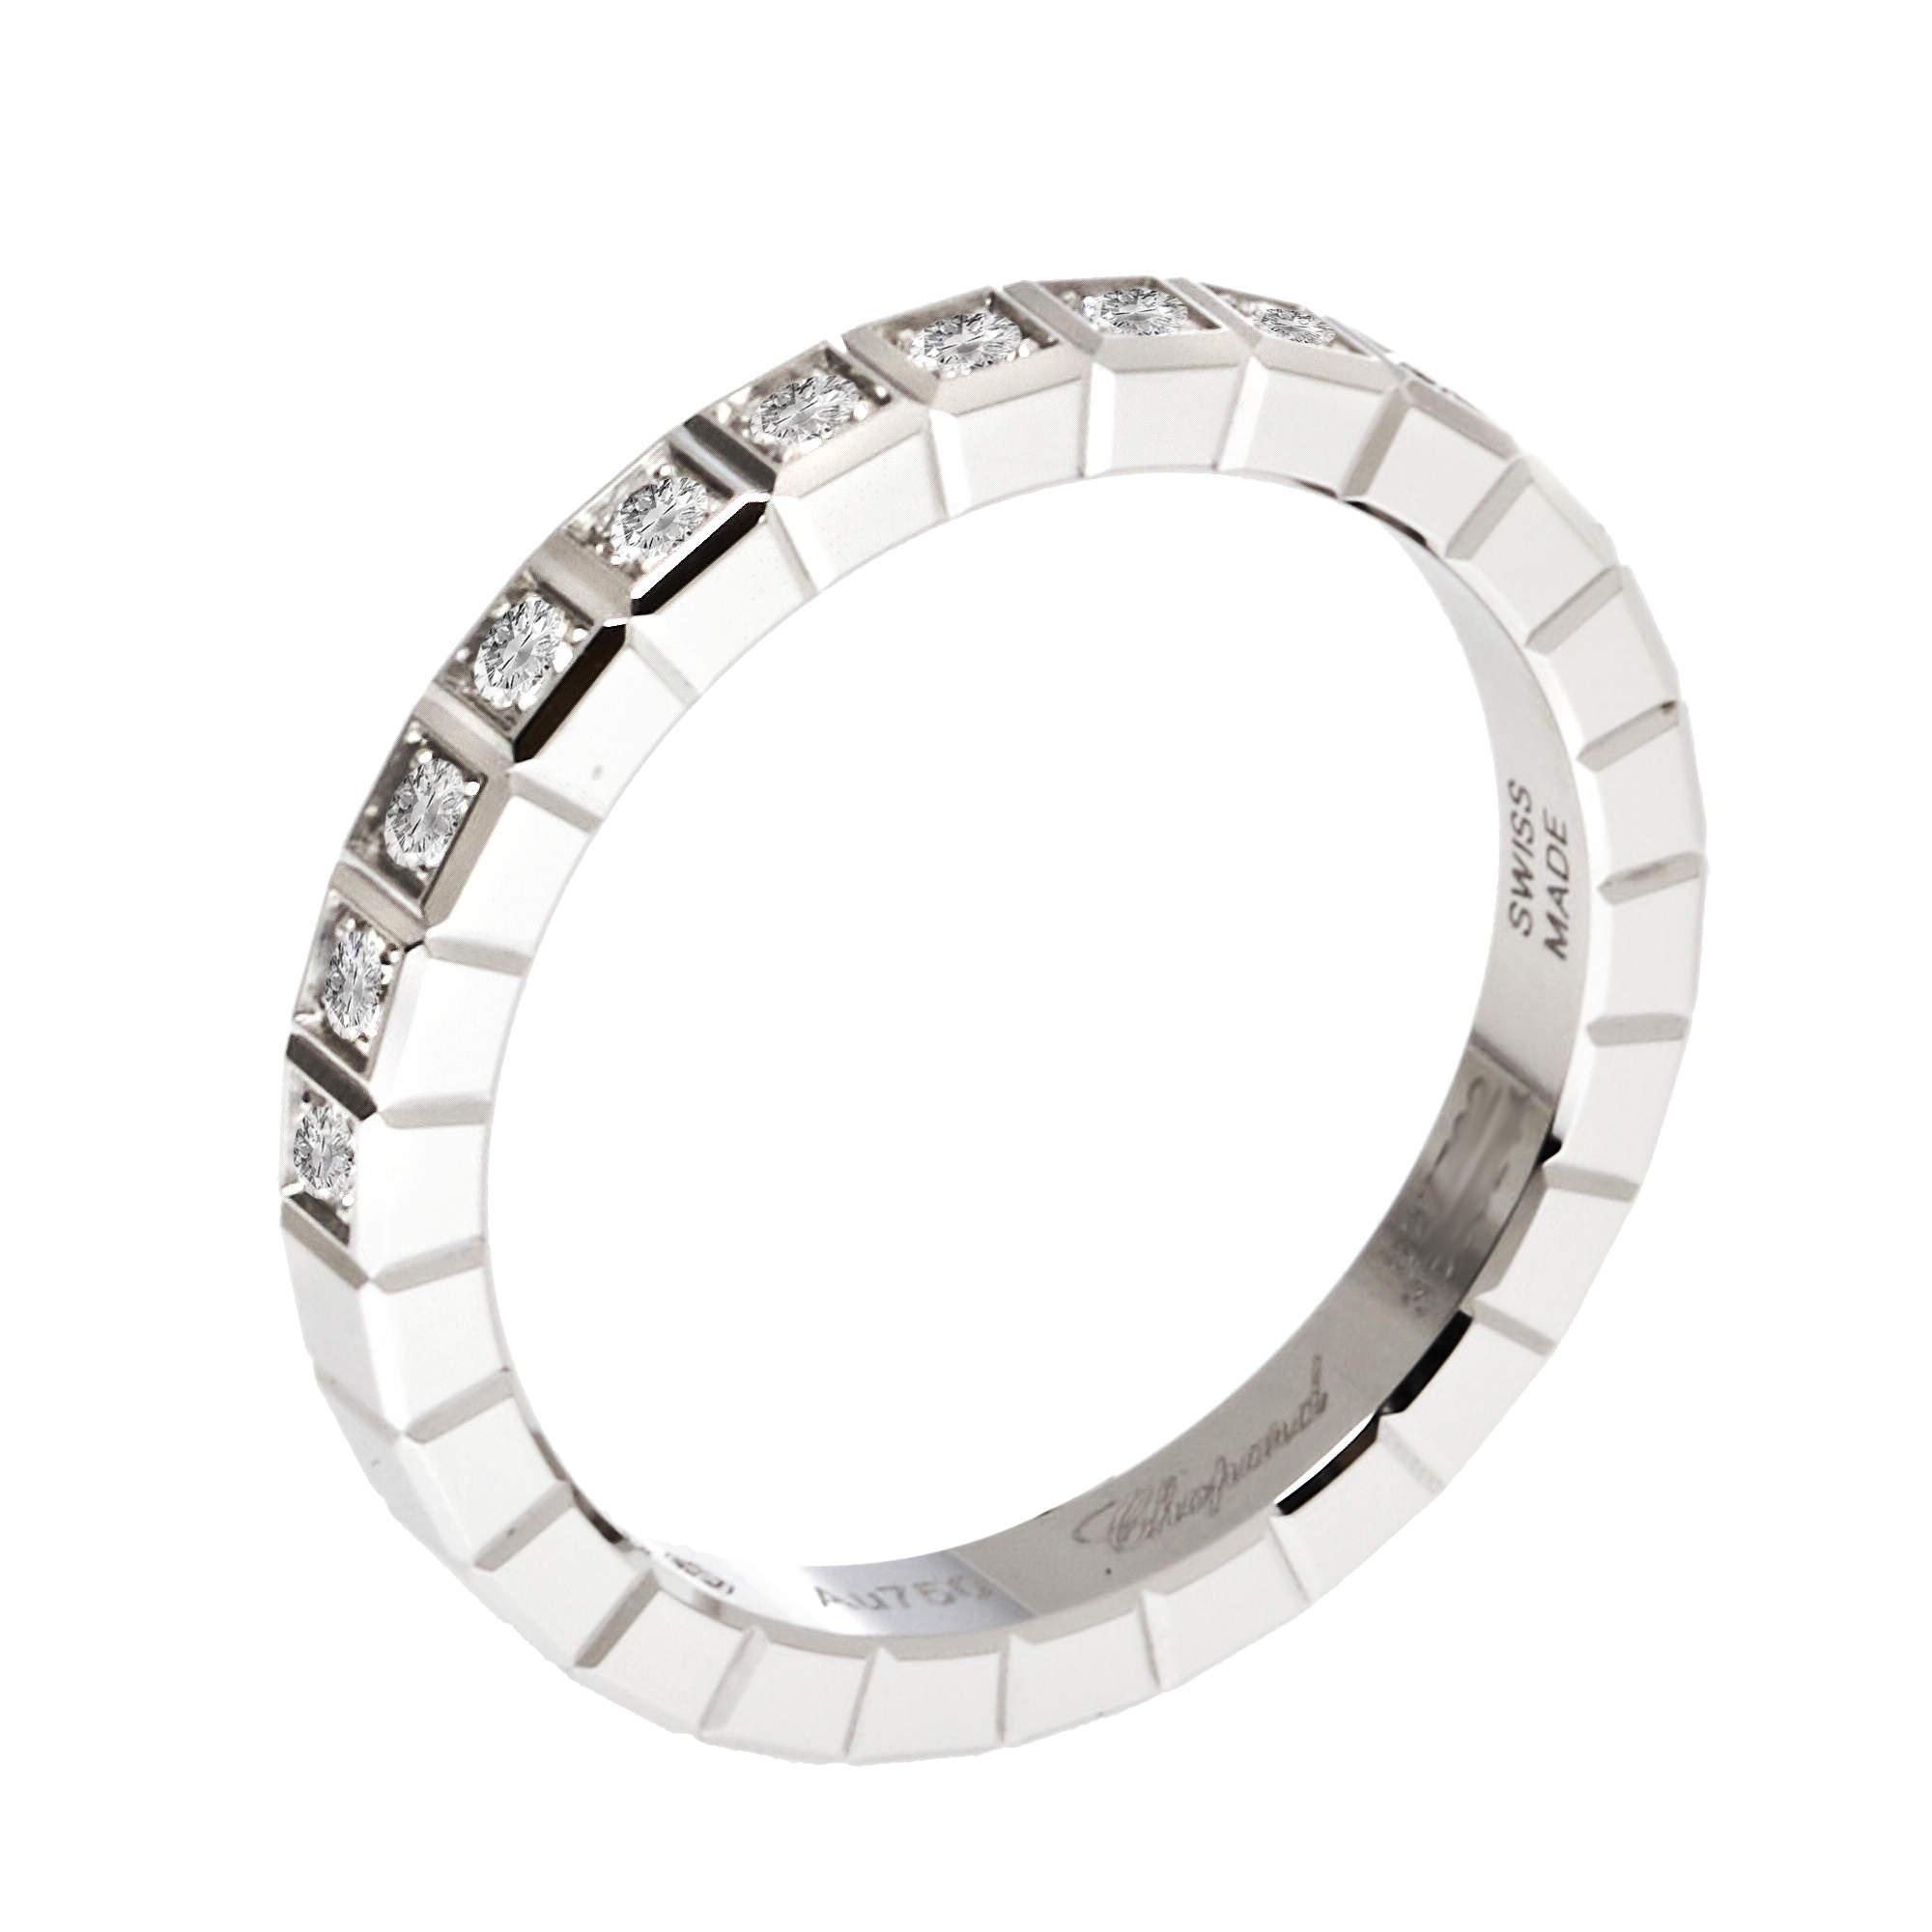 Chopard Ice Cube Pure 18K White Gold Half-Set Diamond Ring Size 47